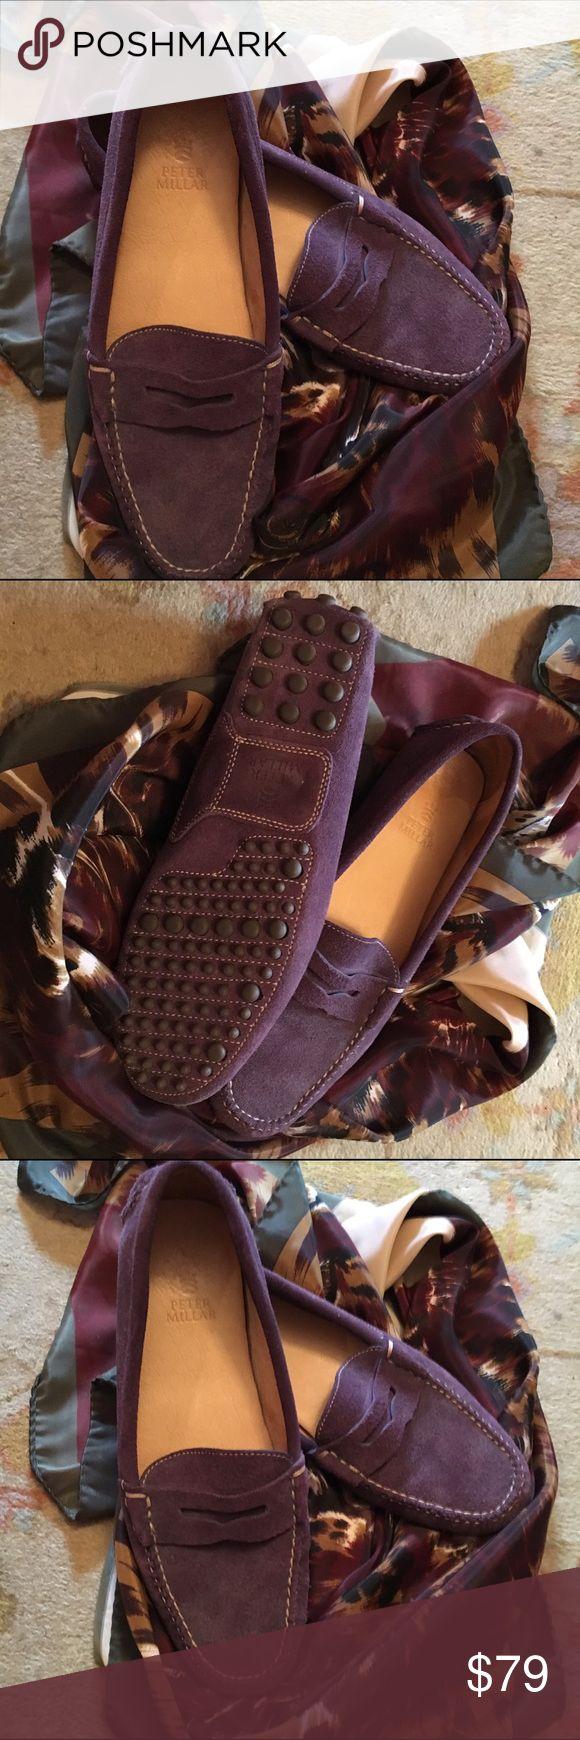 Peter millar suede loafers Peter millar purple suede loafers peter millar Shoes Flats & Loafers